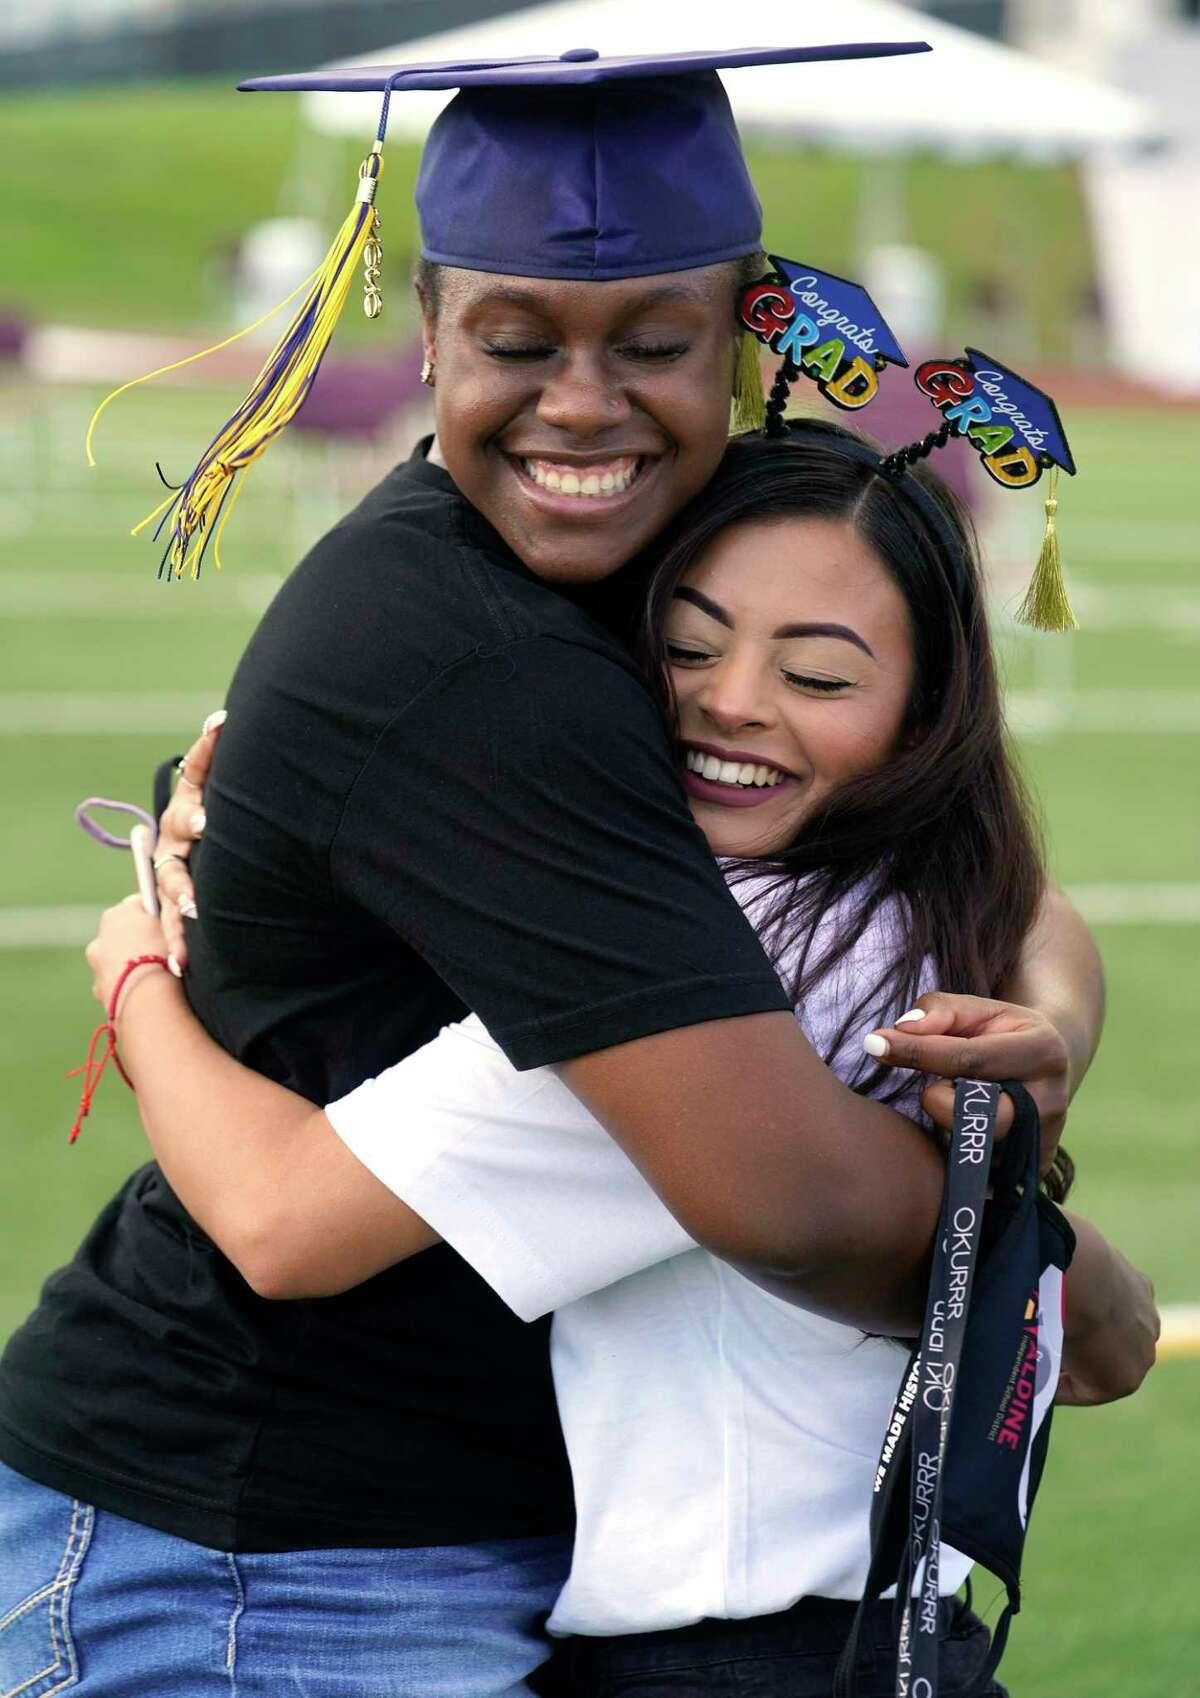 Nimitz High School seniors Tyra Davis and Aracely Hernandez hug at the graduation celebration at W.W. Thorne Stadium.